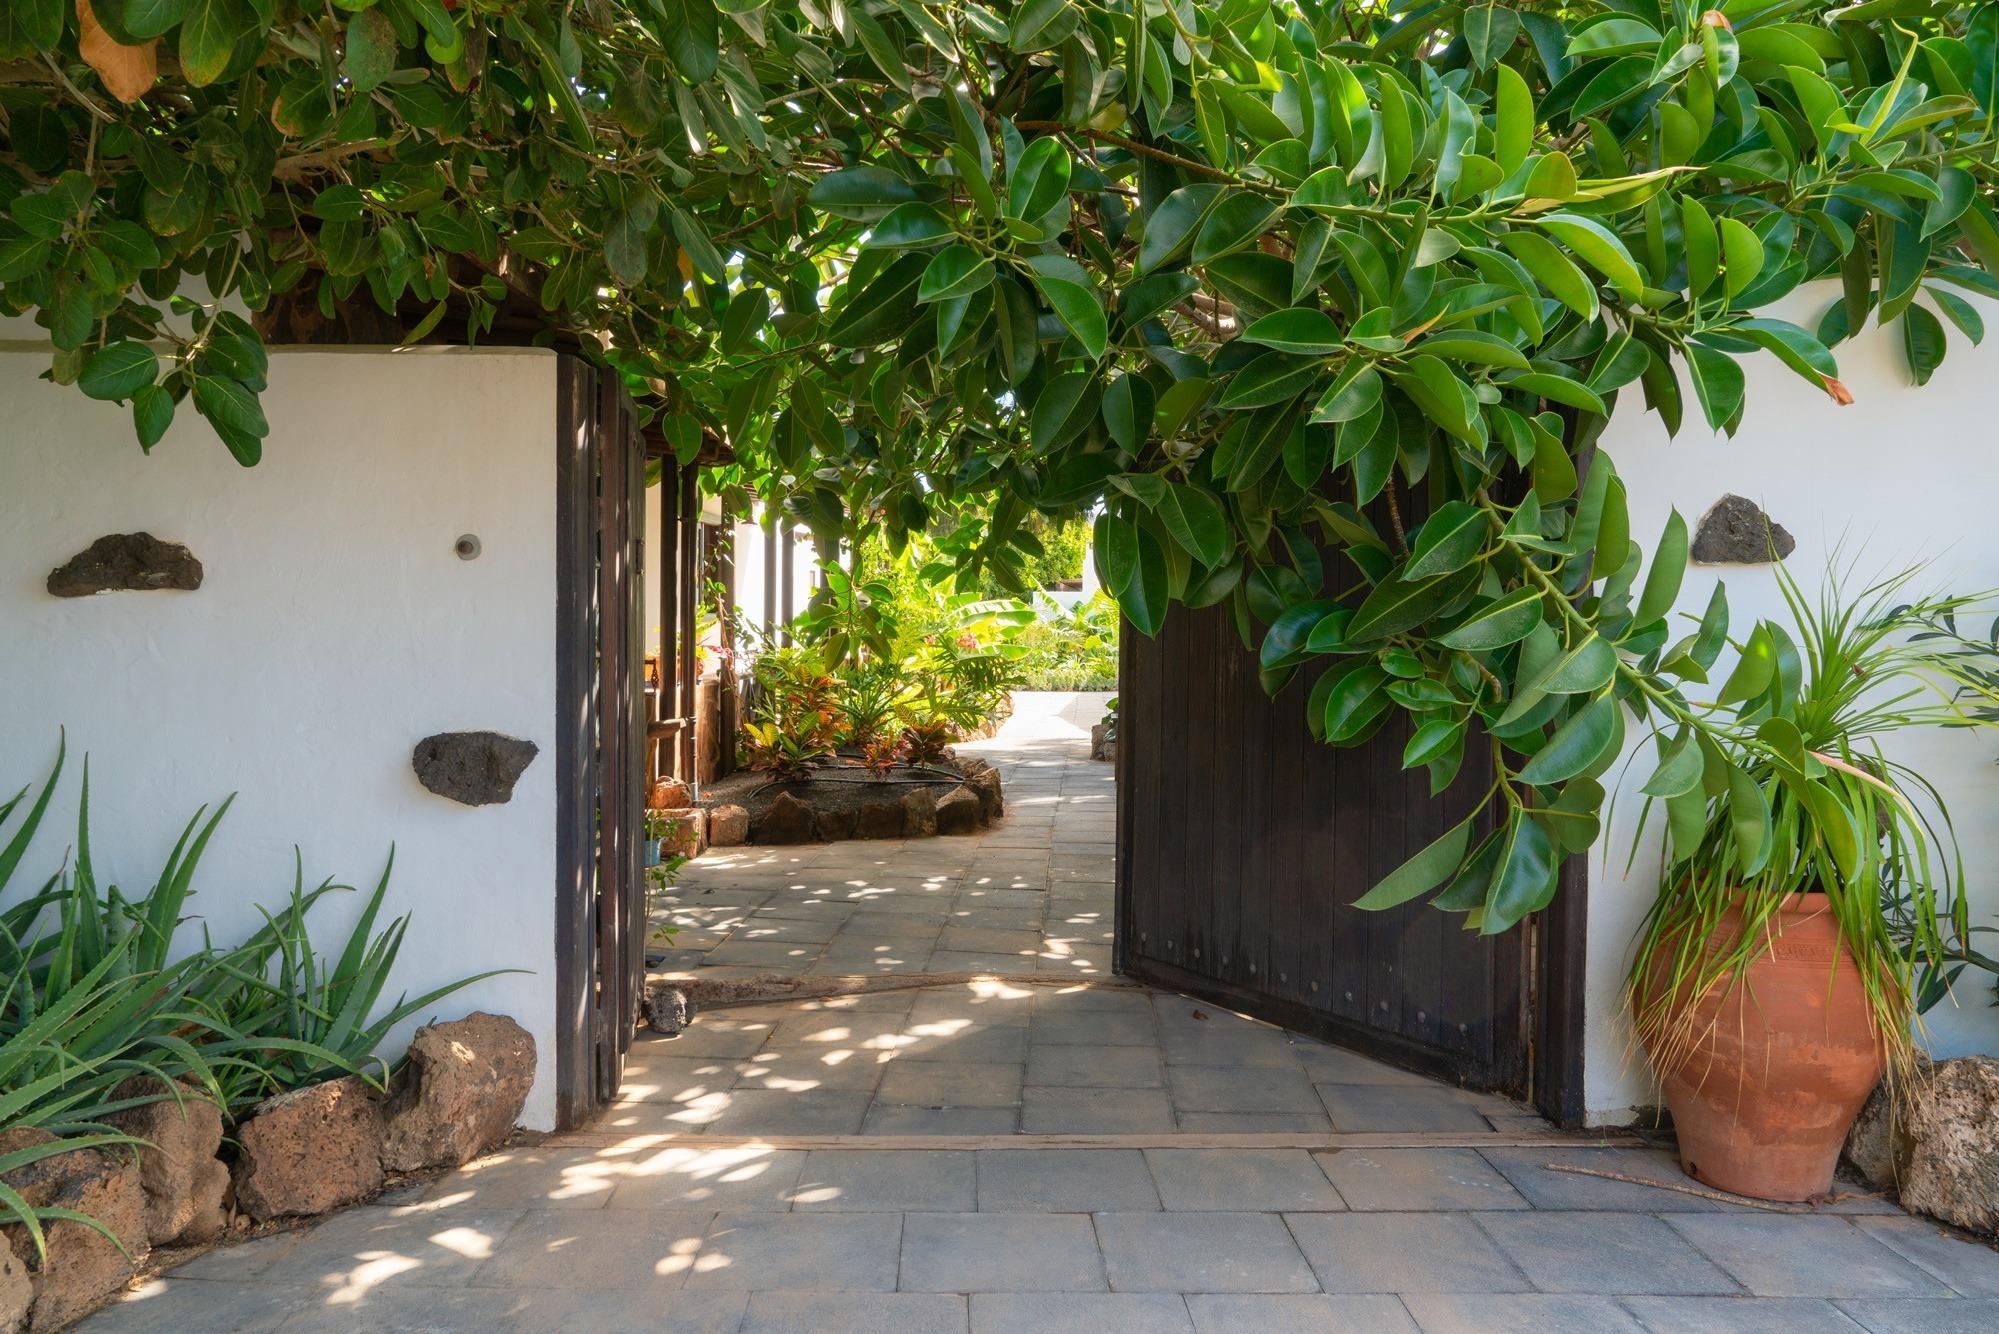 Secret-Garden-Photo-7 Resized_edited_edi